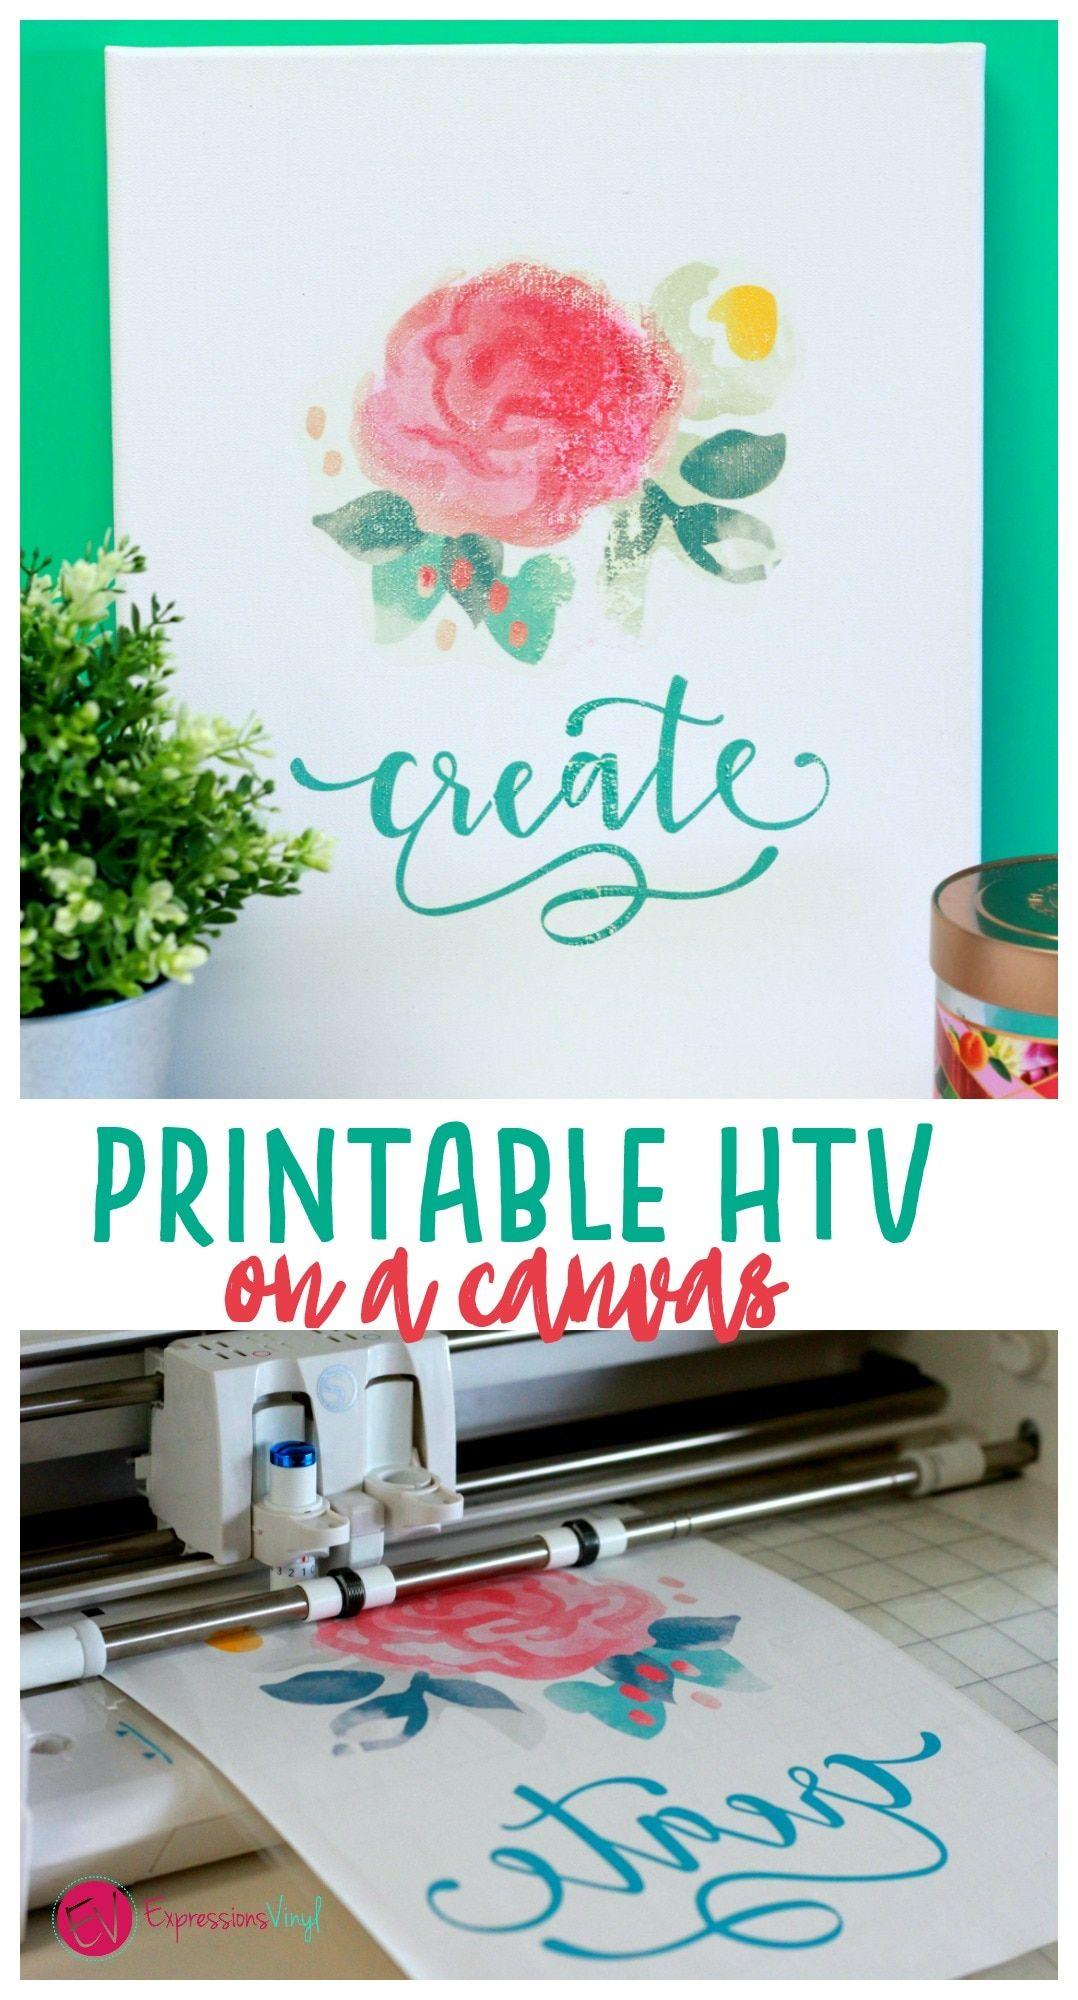 picture regarding Printable Iron on Vinyl called Printable HTV upon canvas Cricut tasks Printable htv